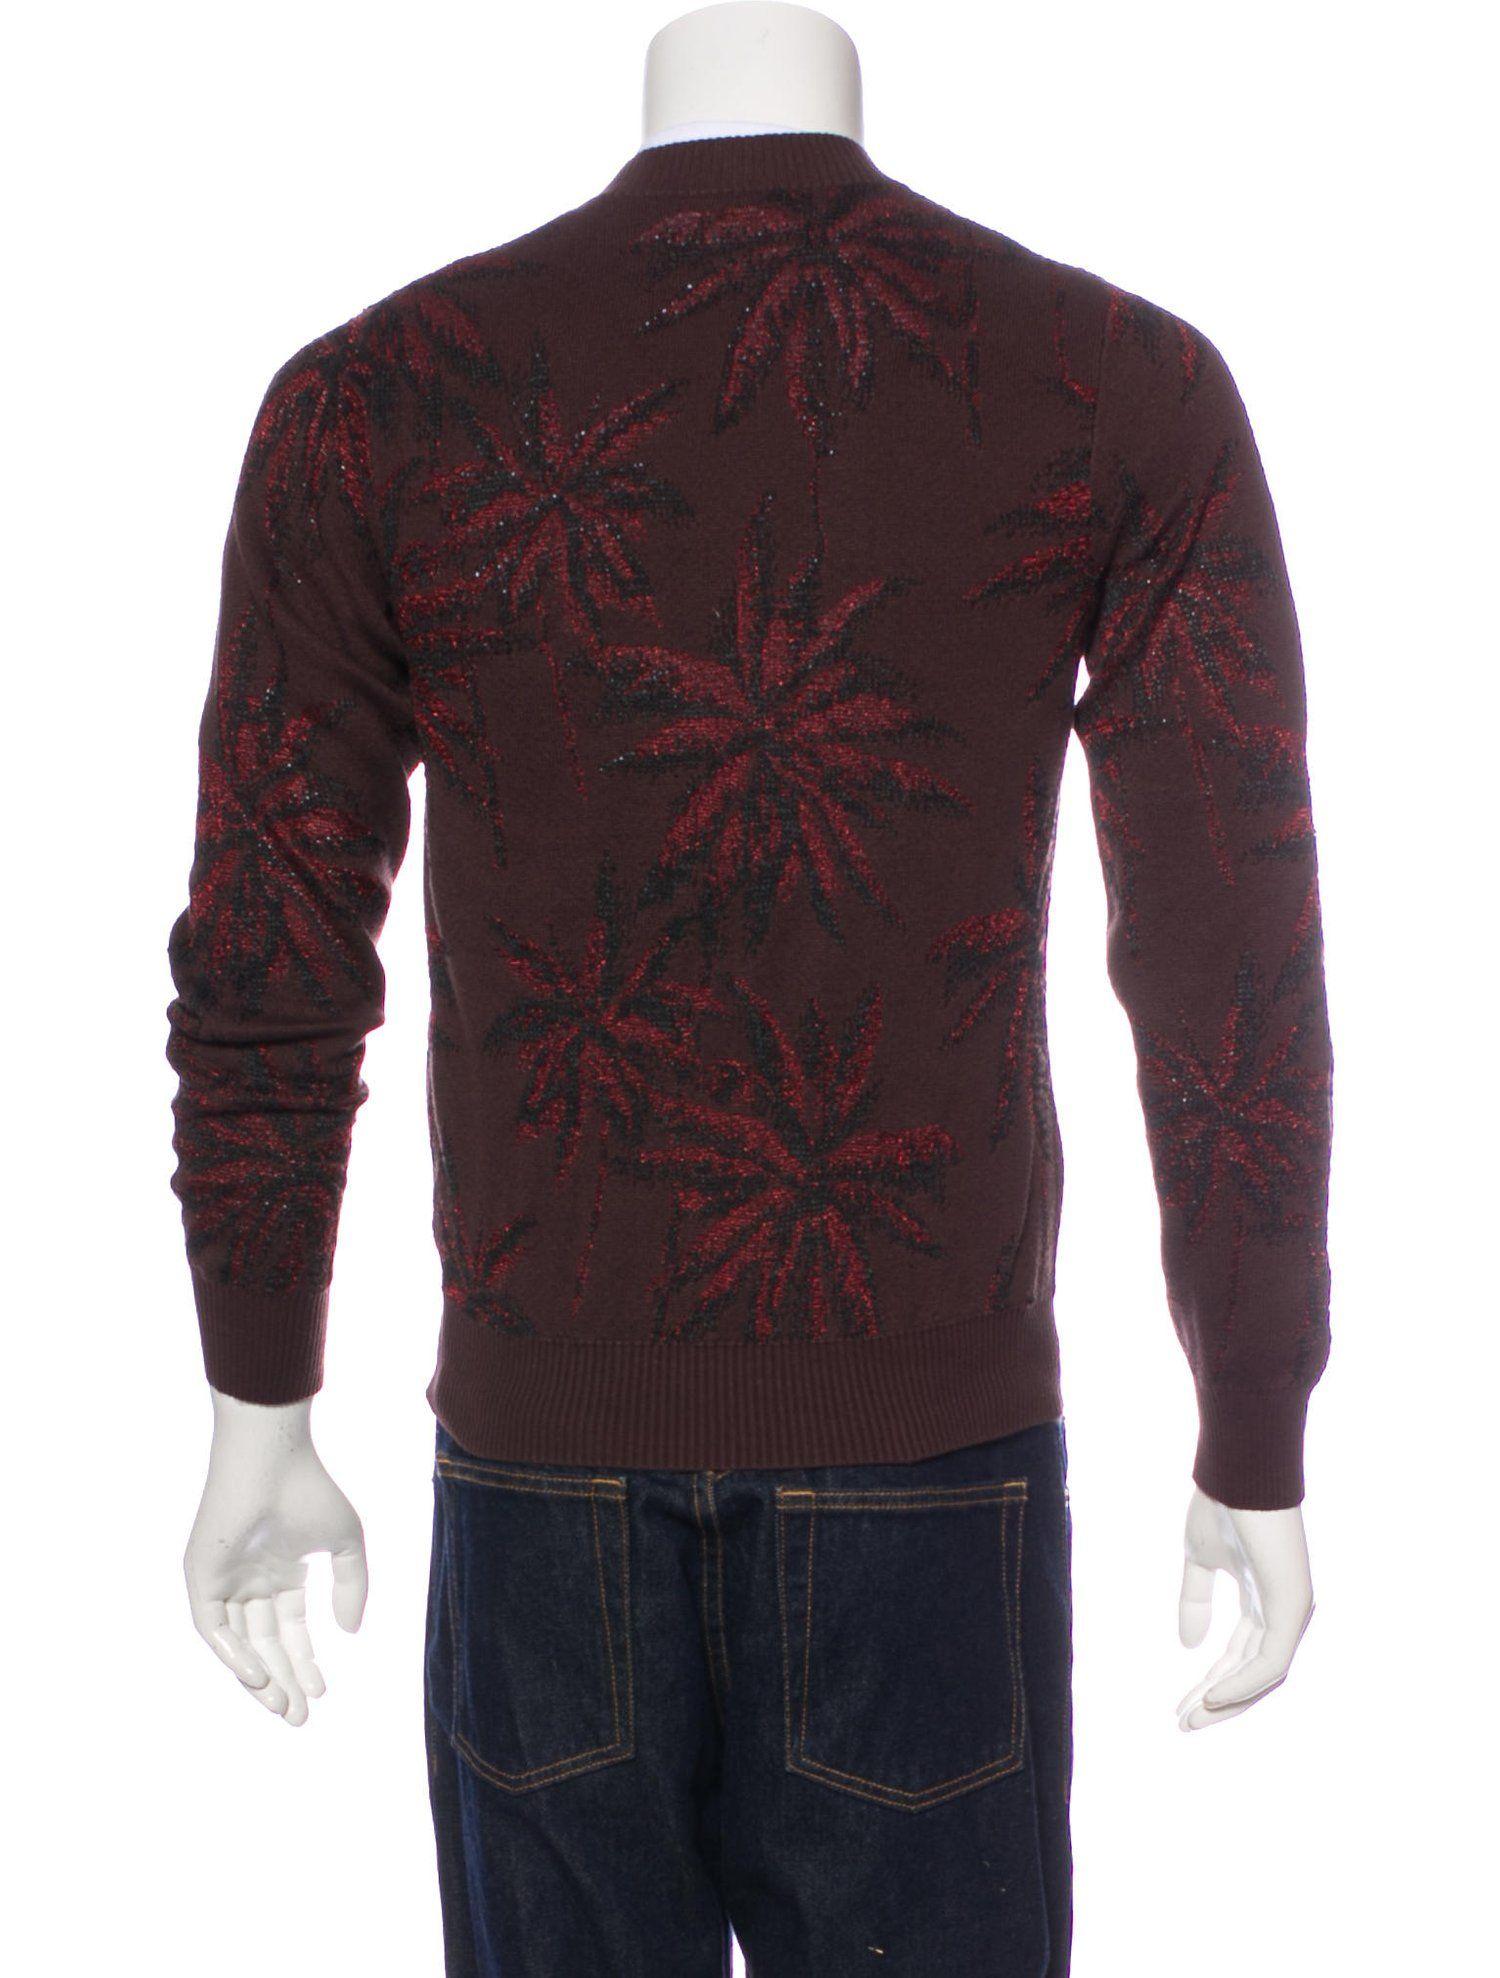 5b0620e606 Dries Van Noten Brocade Knit Jacket - Clothing - DRI46600